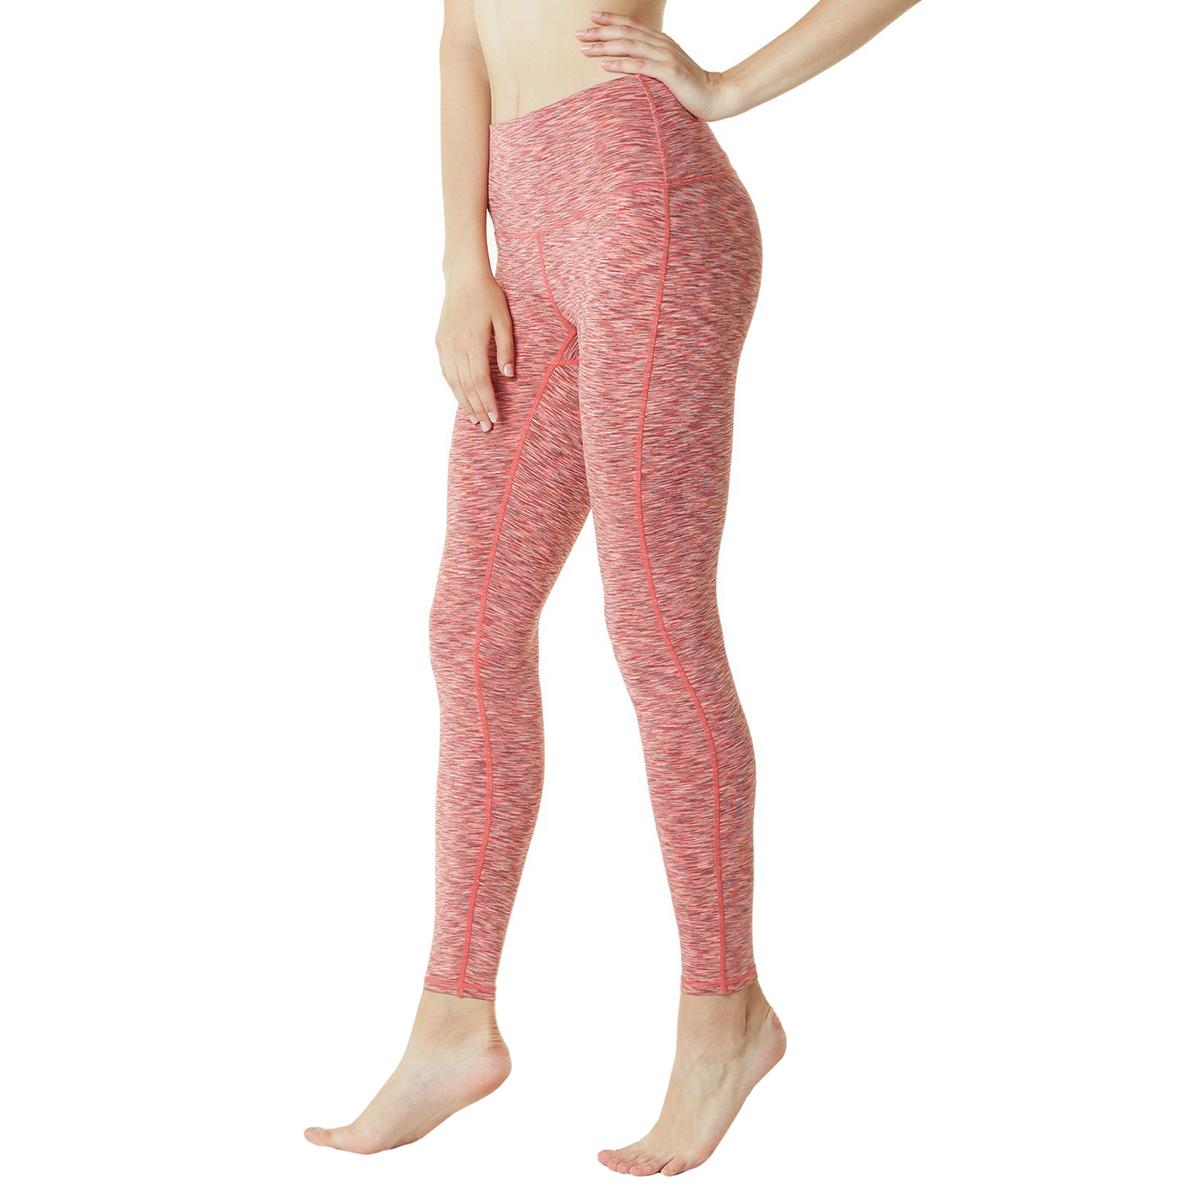 thumbnail 88 - TSLA Tesla FYP42 Women's High-Waisted Ultra-Stretch Tummy Control Yoga Pants